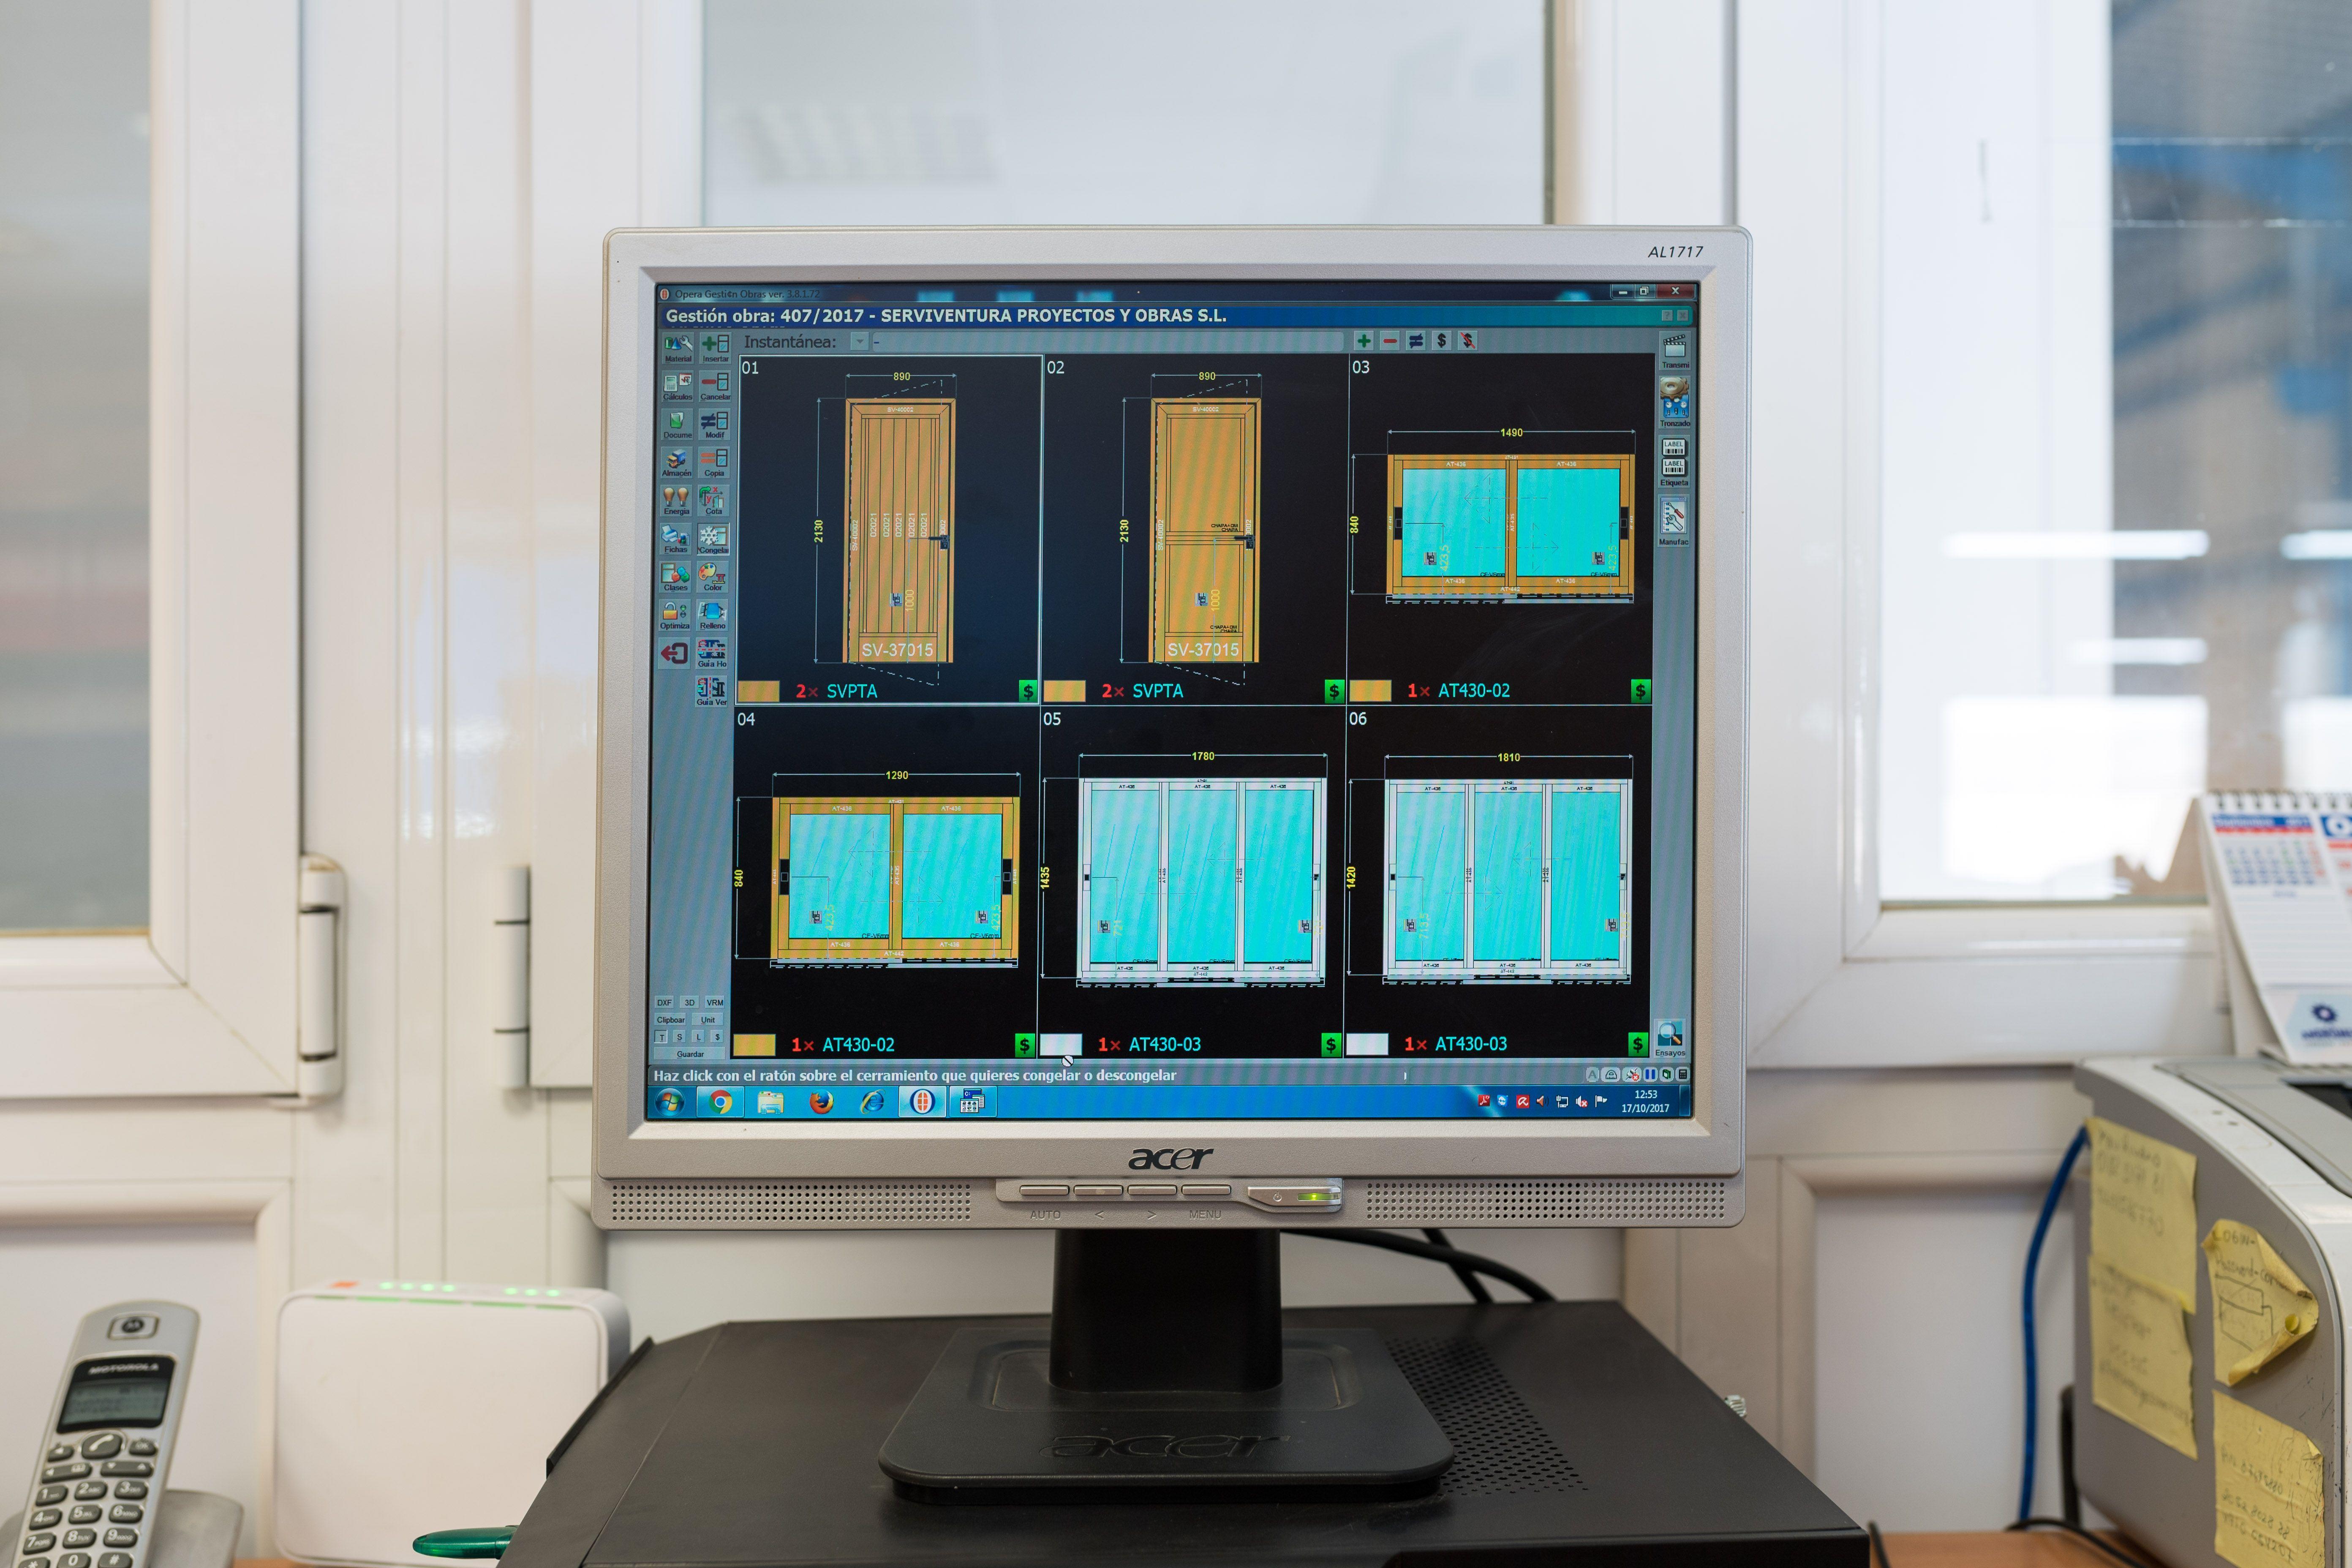 Proyectos de fabricación de ventanas de aluminio por ordenador